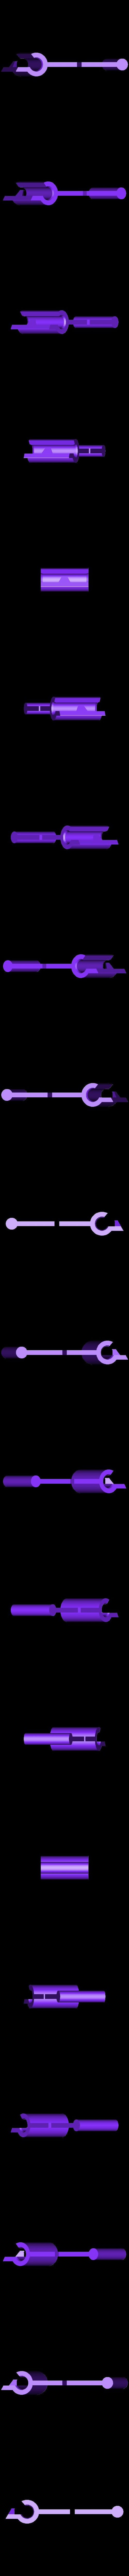 choker_clasp.stl Download free STL file Choker Clasp • 3D print object, AlbertKhan3D